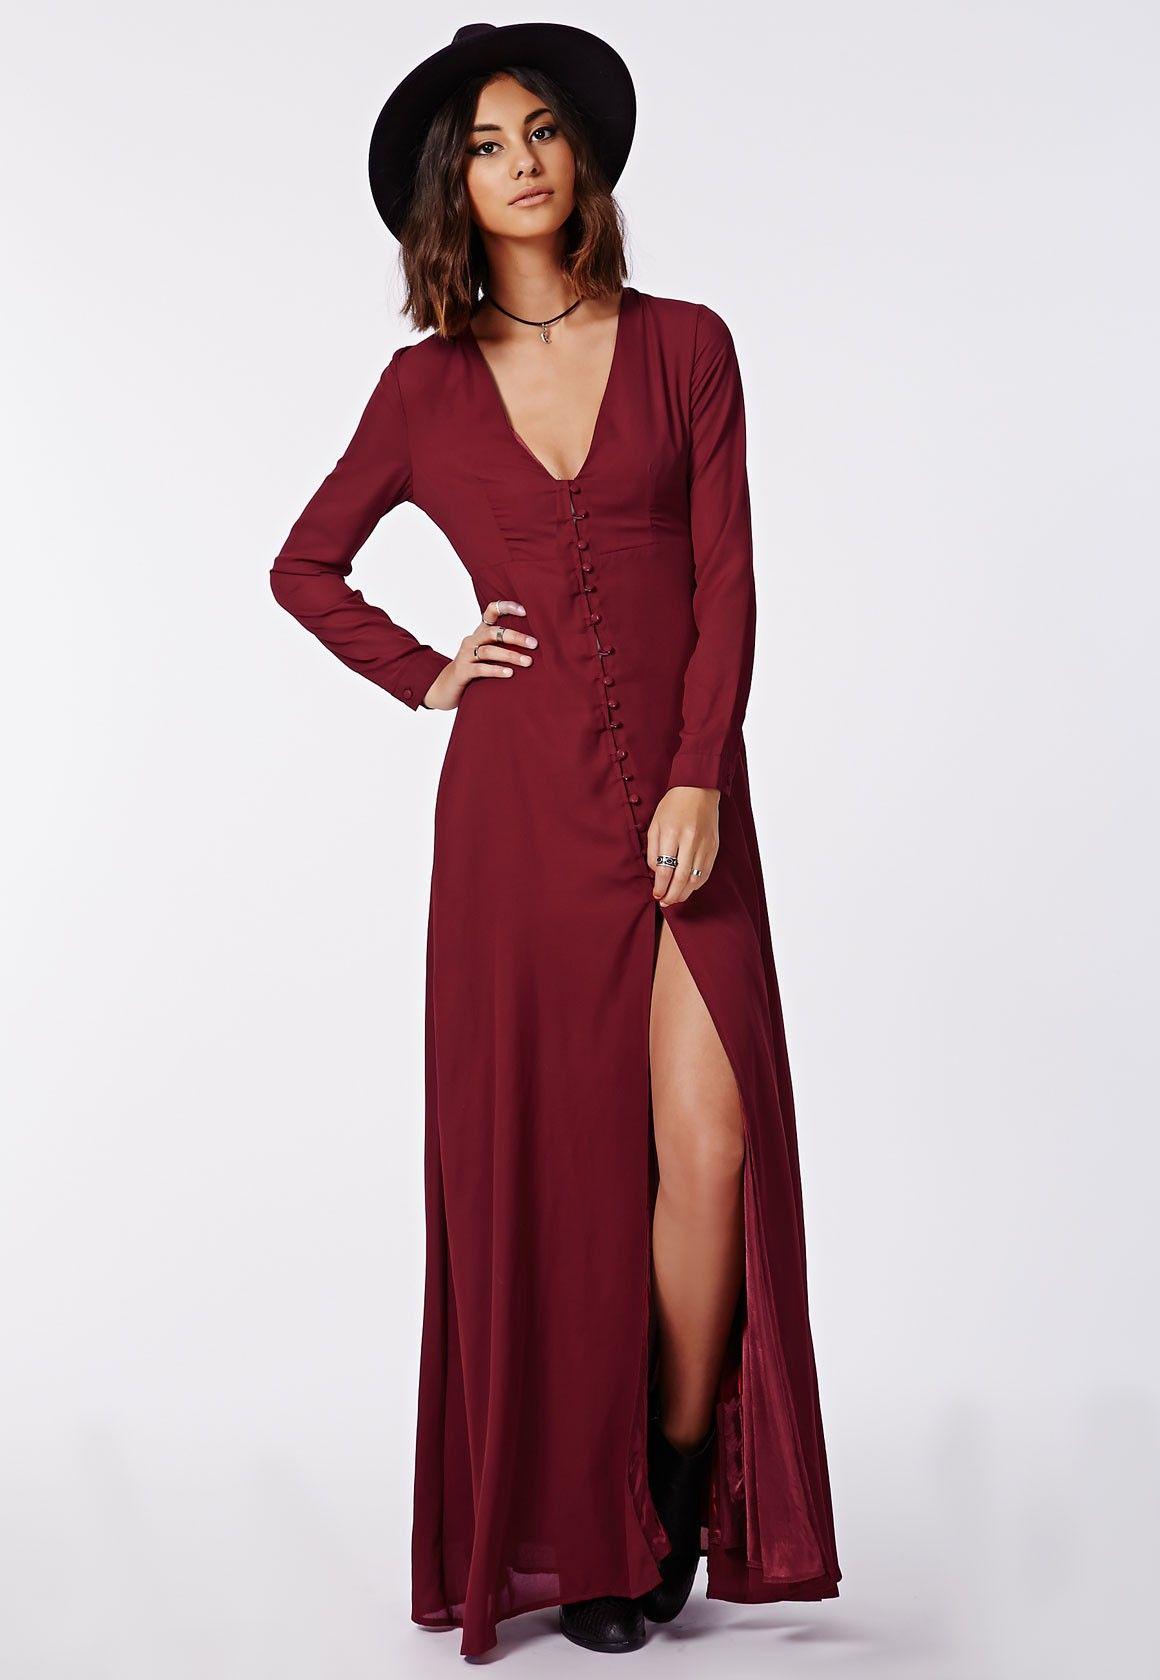 Missguided Effie Long Sleeve Maxi Dress Burgundy Long Sleeve Maxi Dress Maxi Dress Online Dress Shopping [ 1680 x 1160 Pixel ]